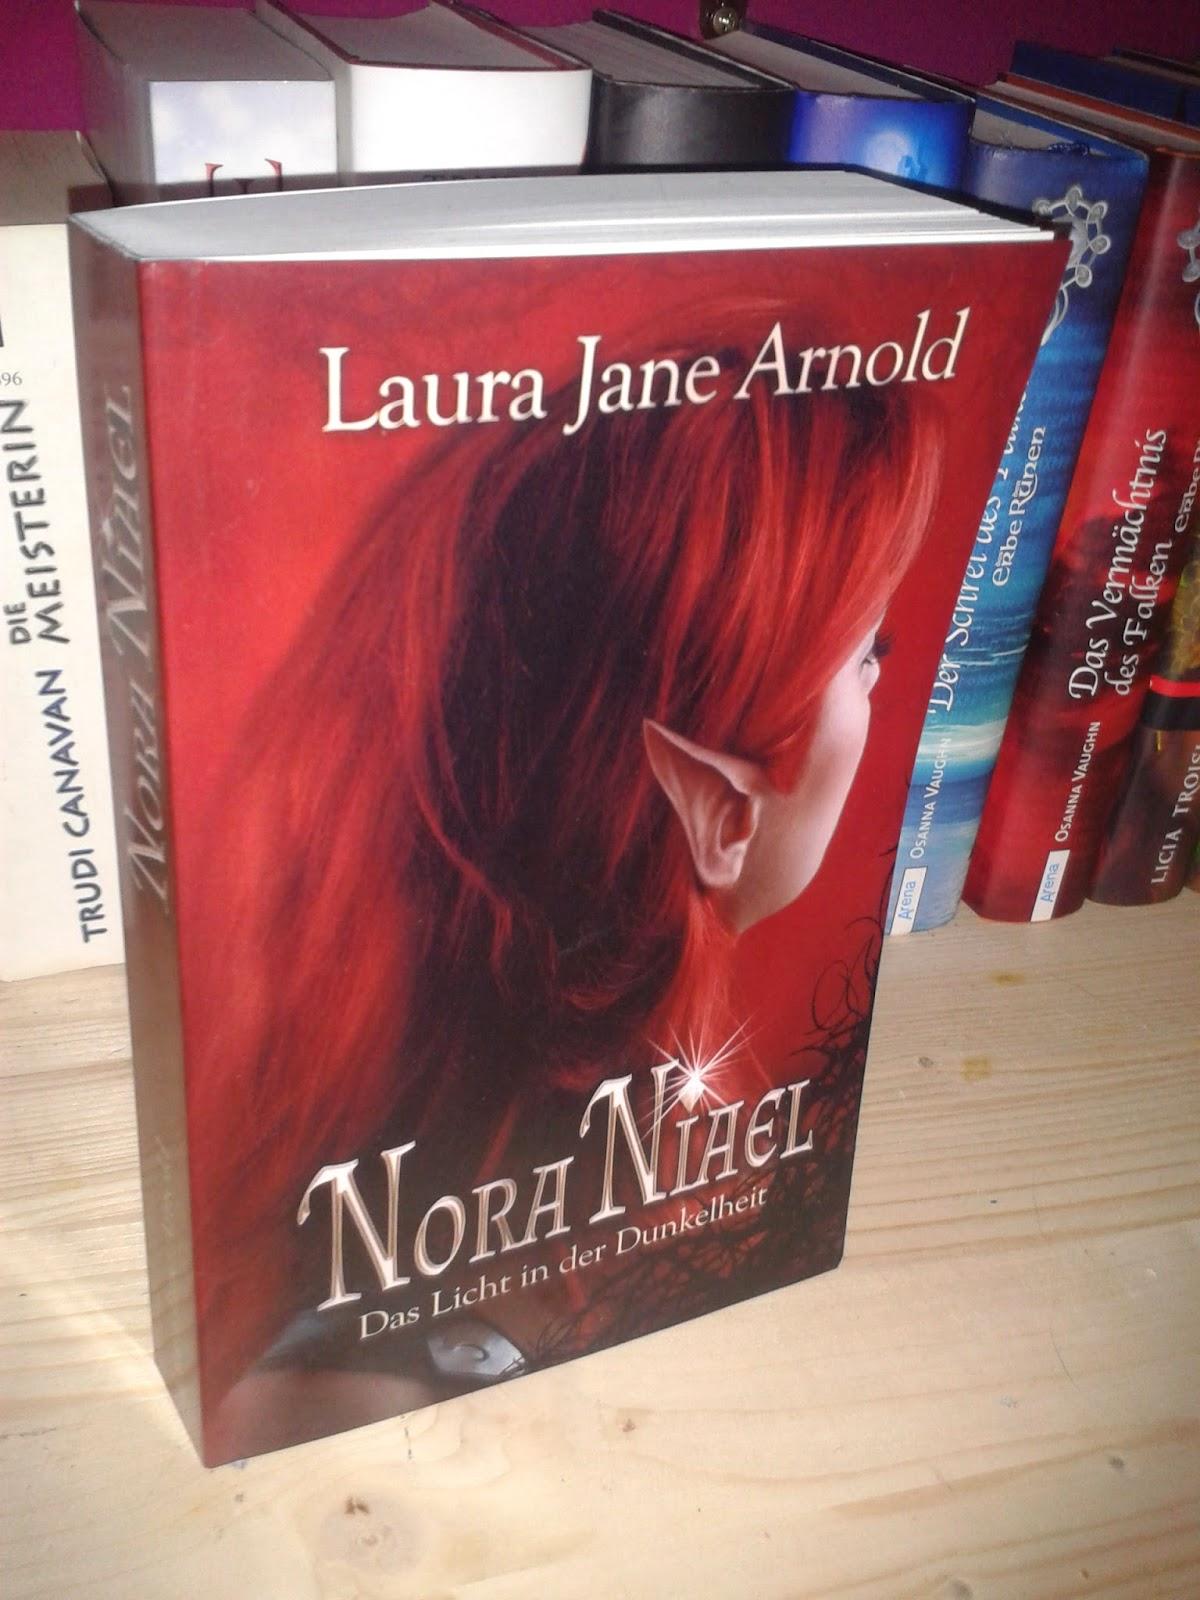 http://www.amazon.de/Nora-Niael-Das-Licht-Dunkelheit/dp/1495485439/ref=sr_1_1?s=books&ie=UTF8&qid=1398428379&sr=1-1&keywords=Nora+Niael